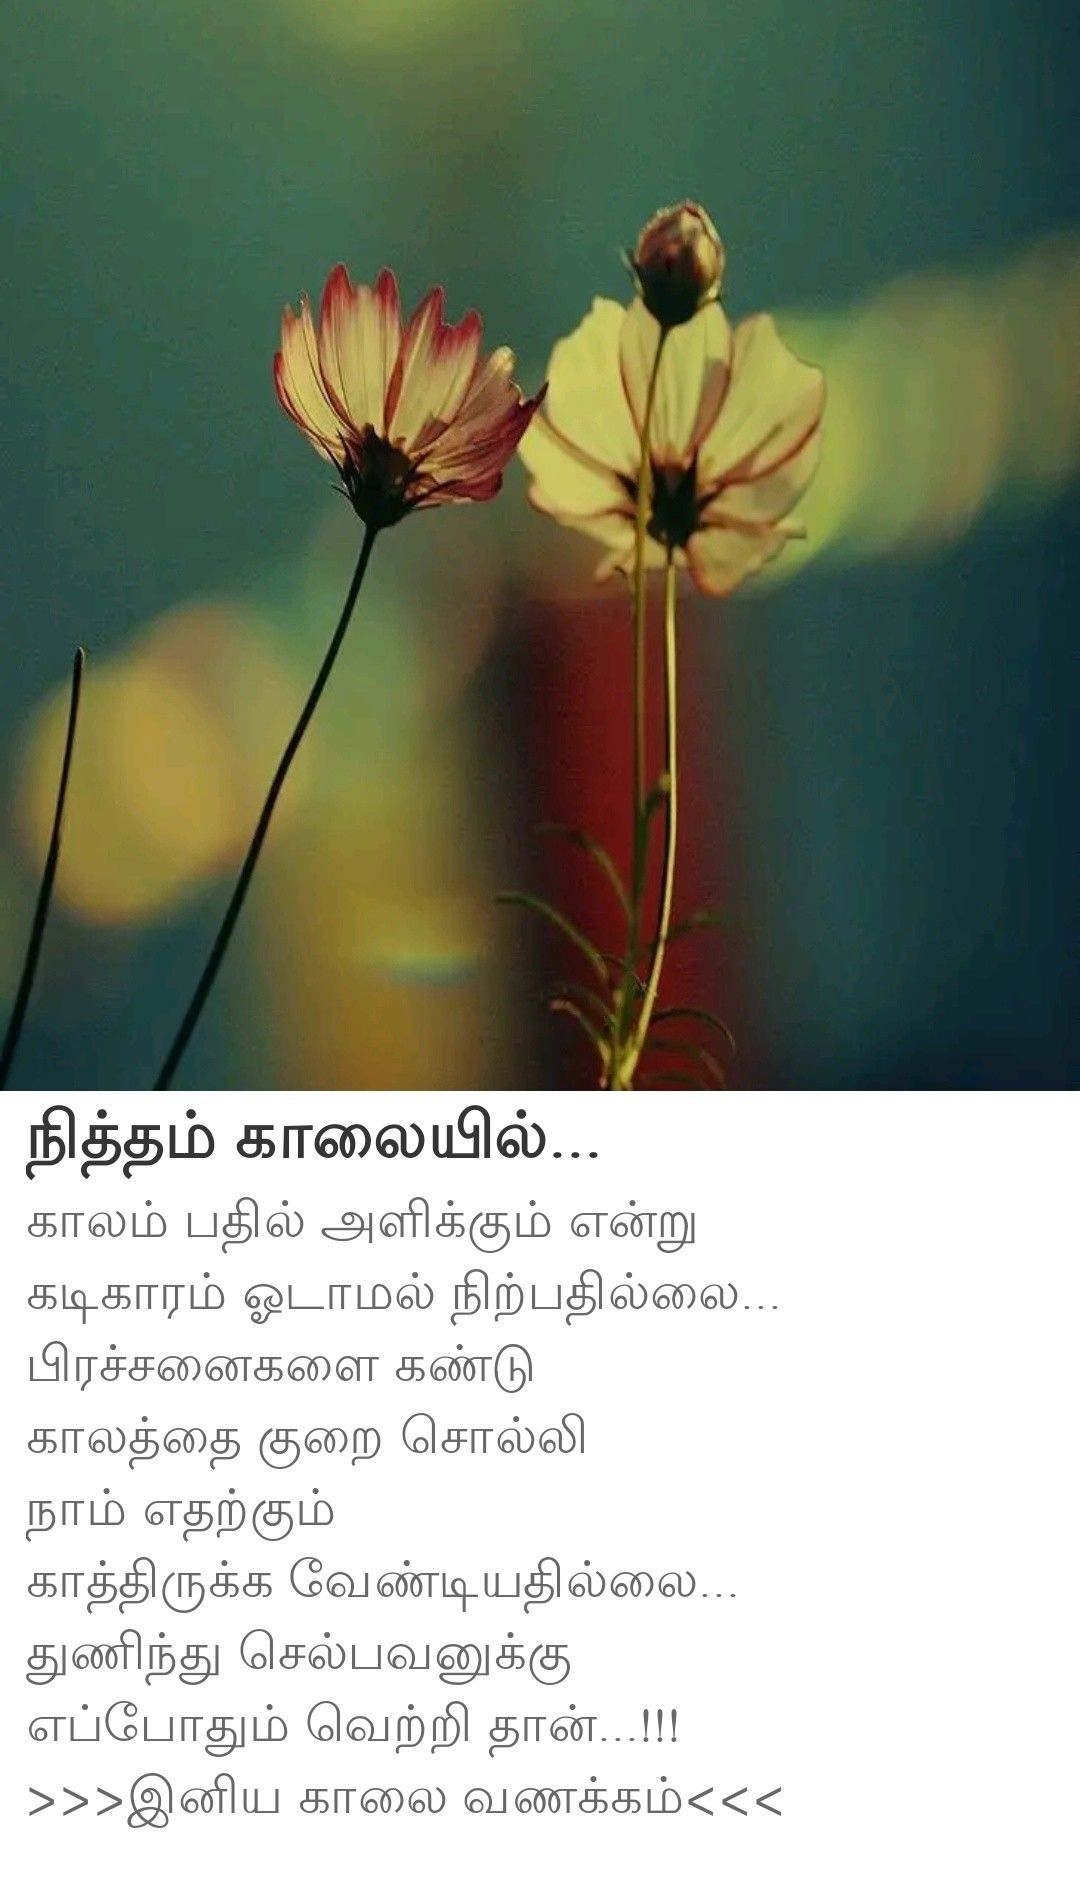 Pin By Ezhilchezhiyan On Wishes In 2020 Plants Dandelion Flowers